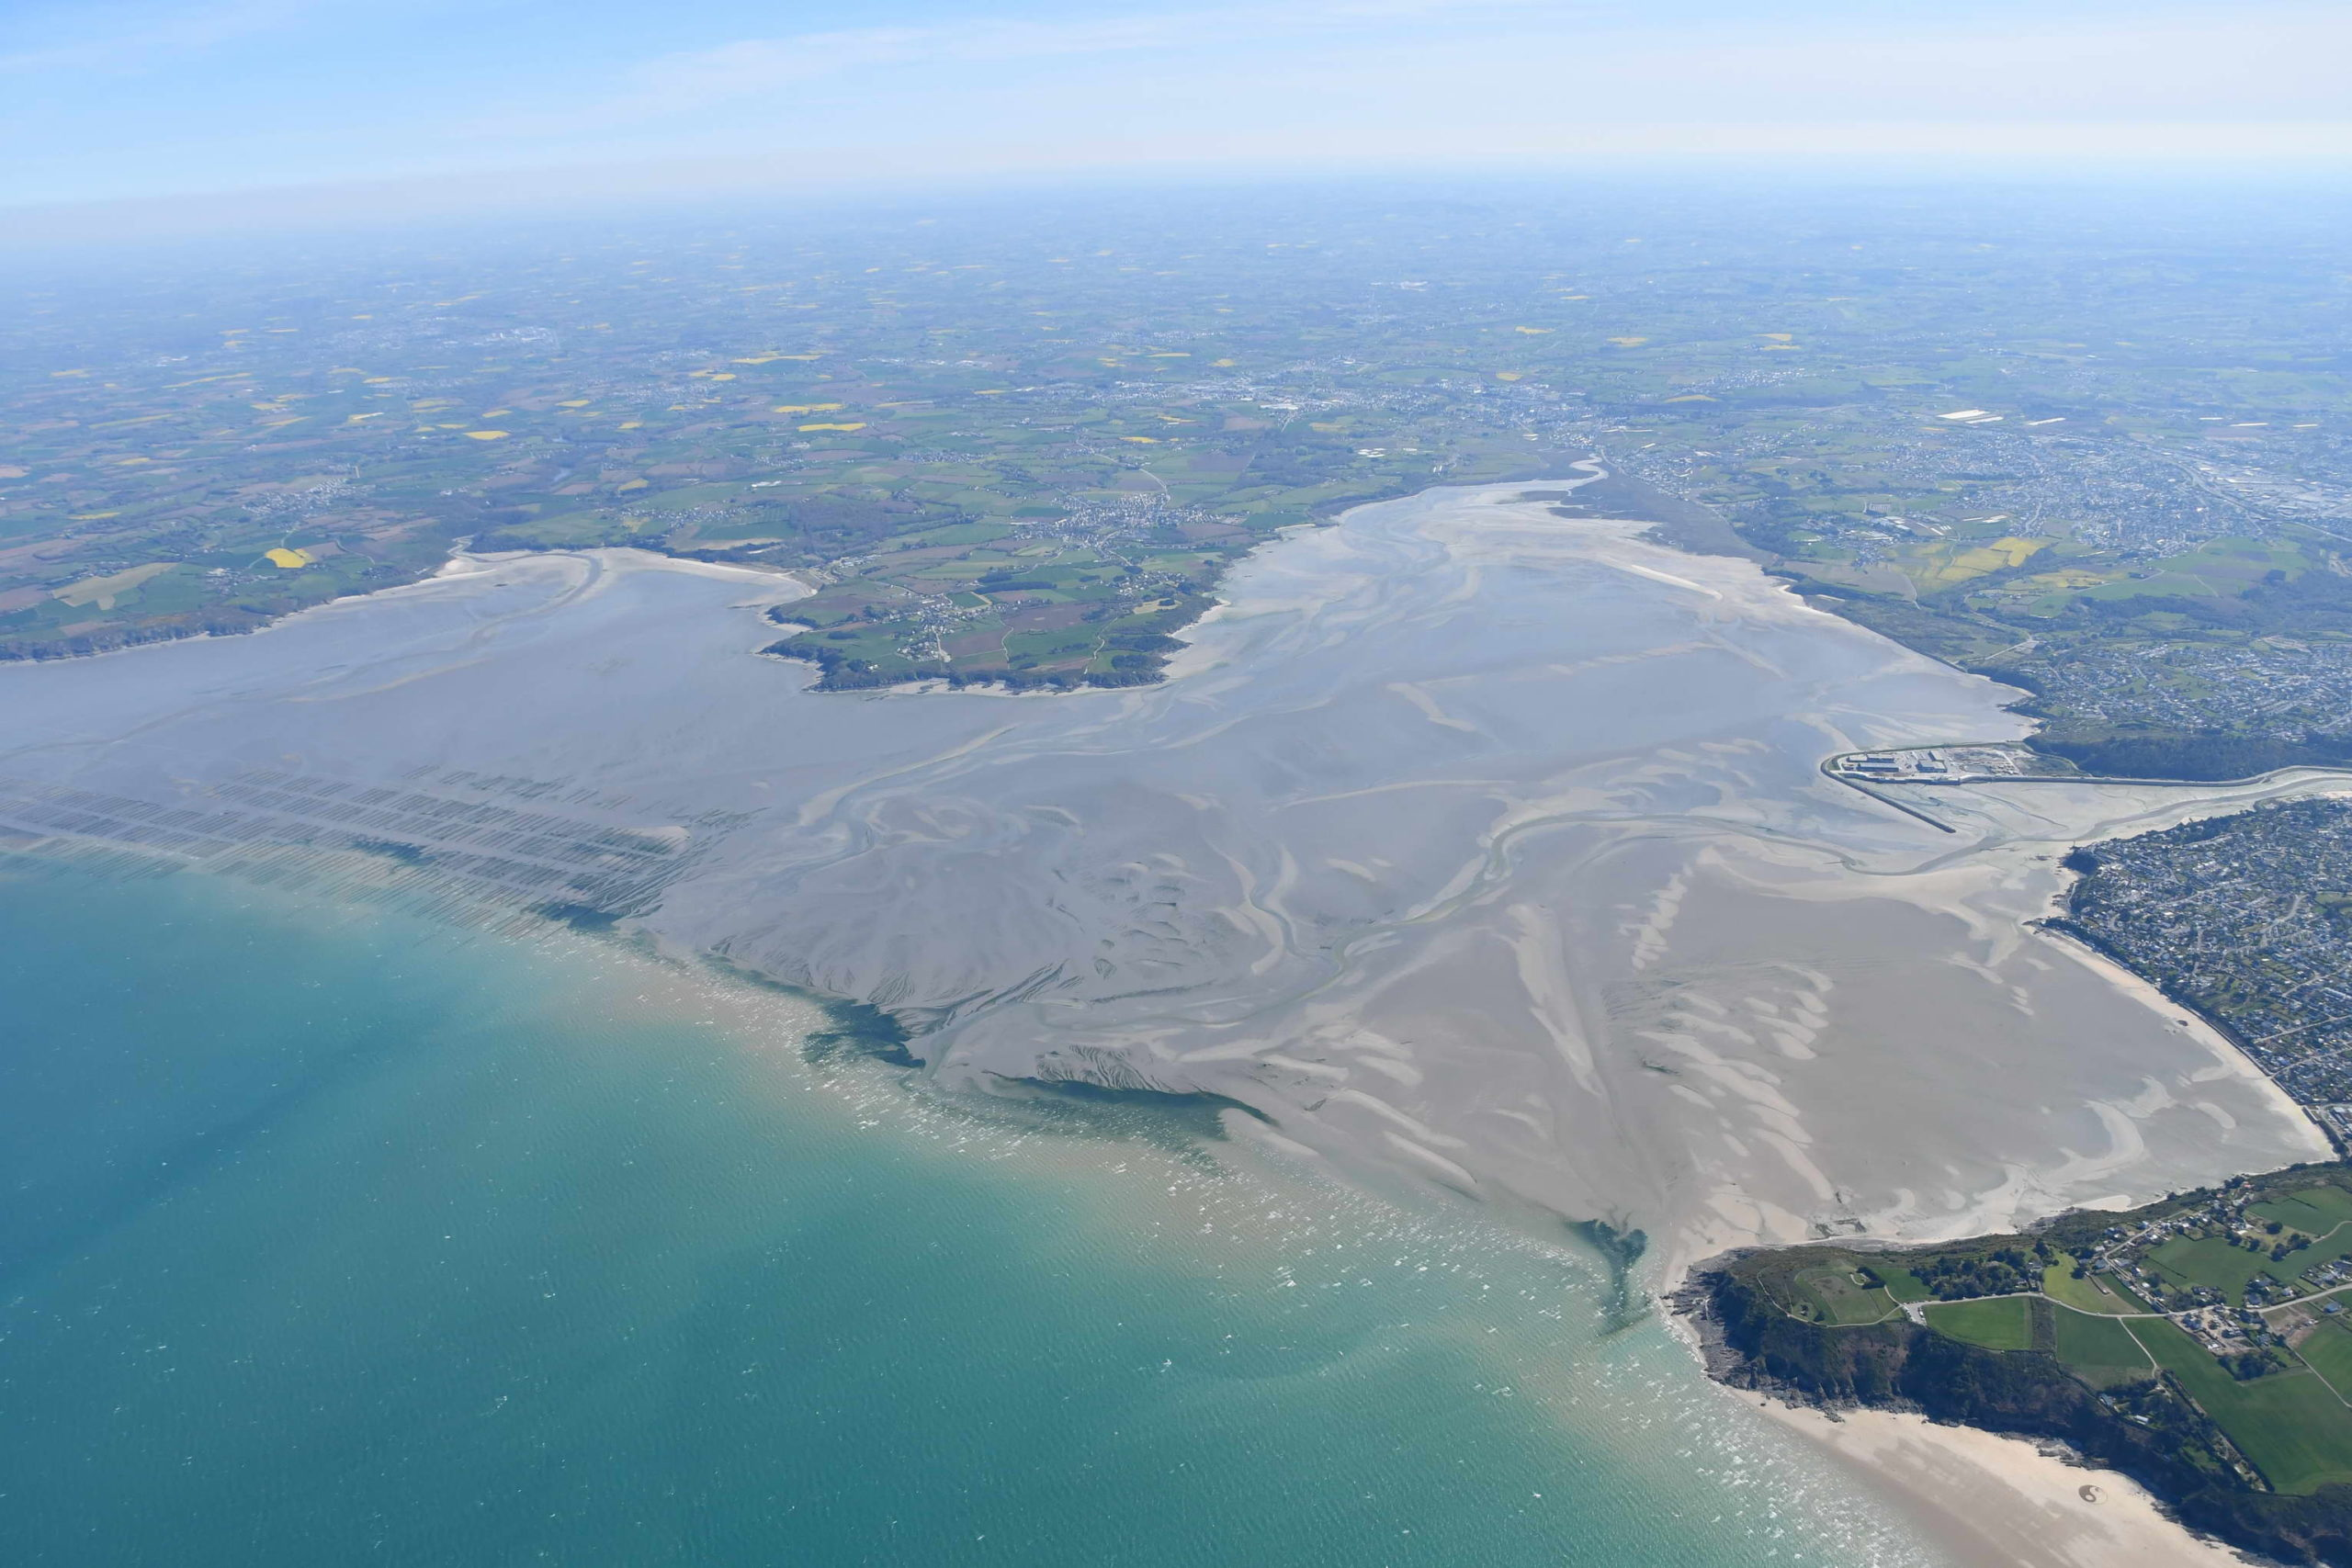 Baie de Saint-Brieuc - anse d'Yffiniac. Avril 2021. ©CEVA